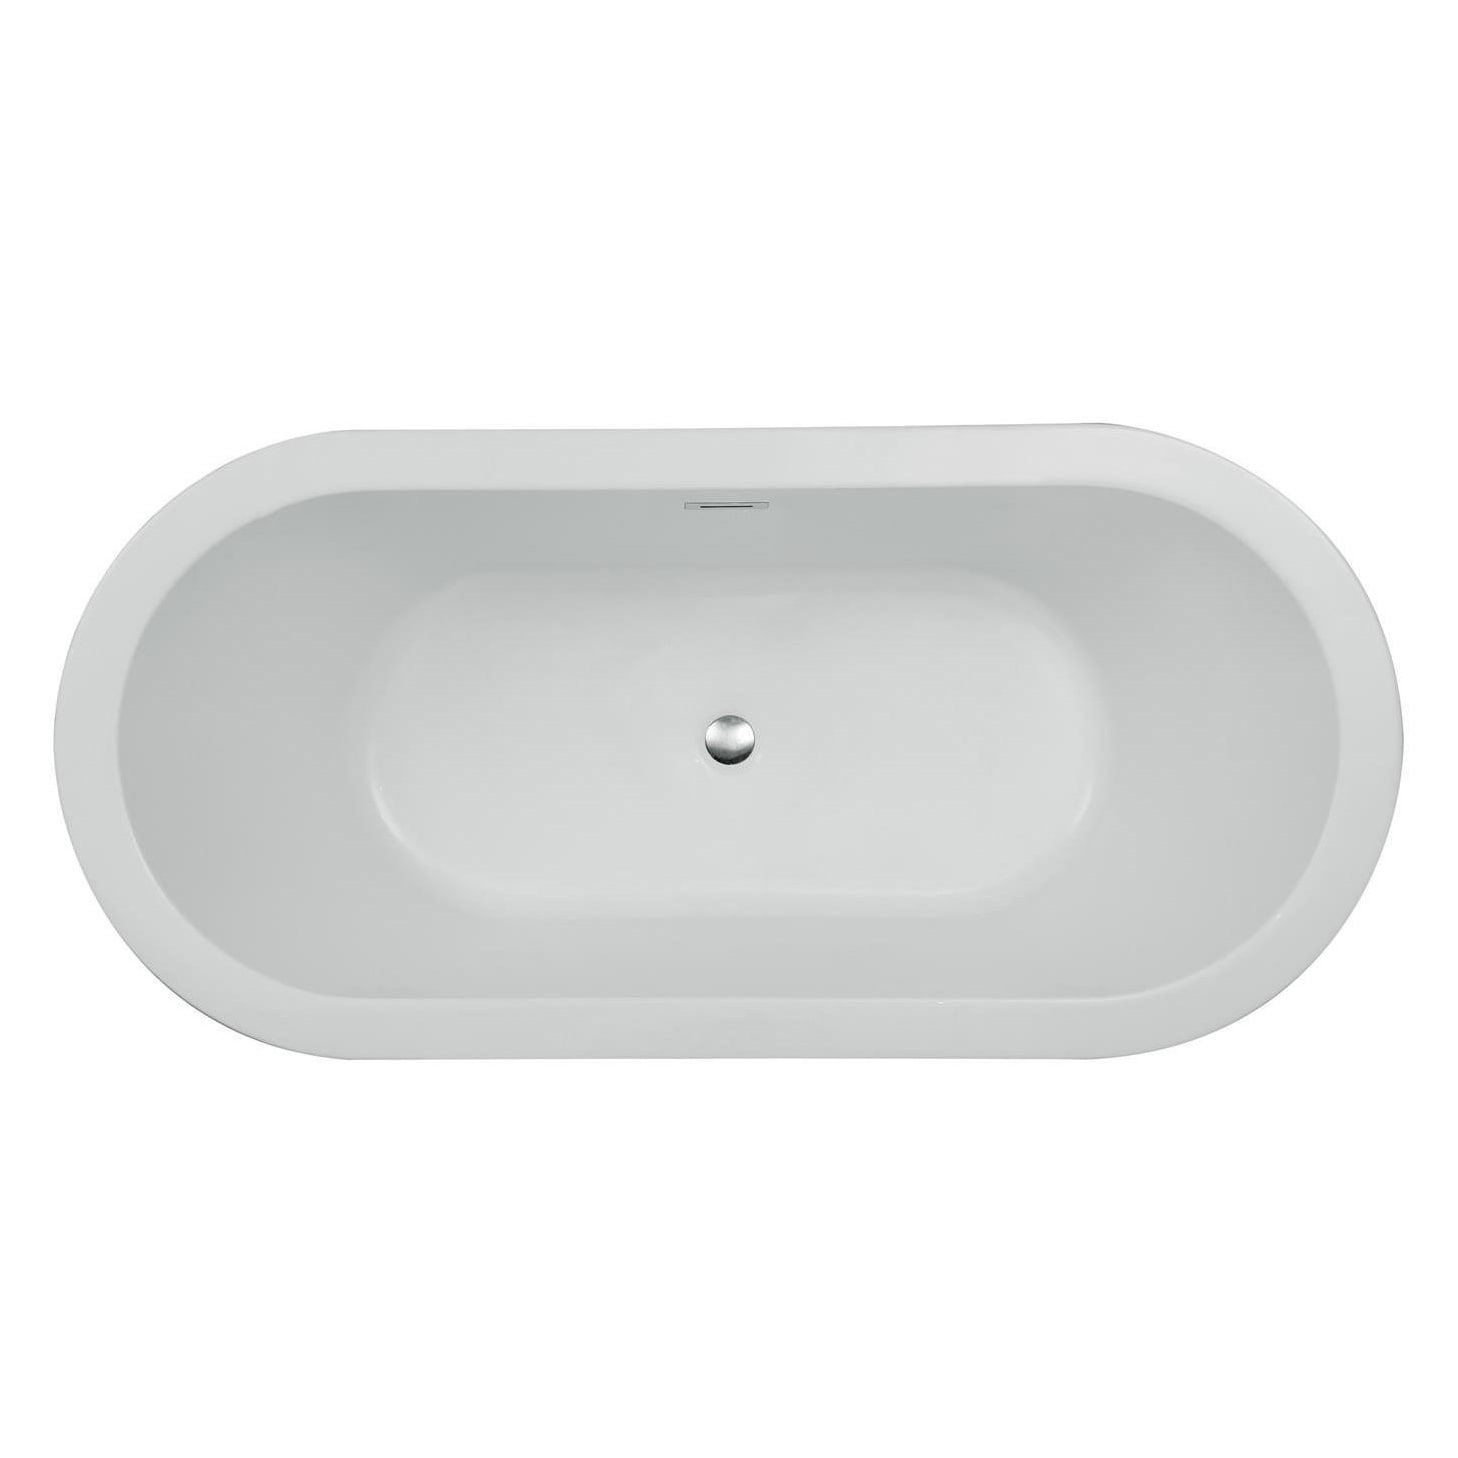 Shop Ariel Platinum Charlotte White Acrylic 67-inch Oval Bathtub ...